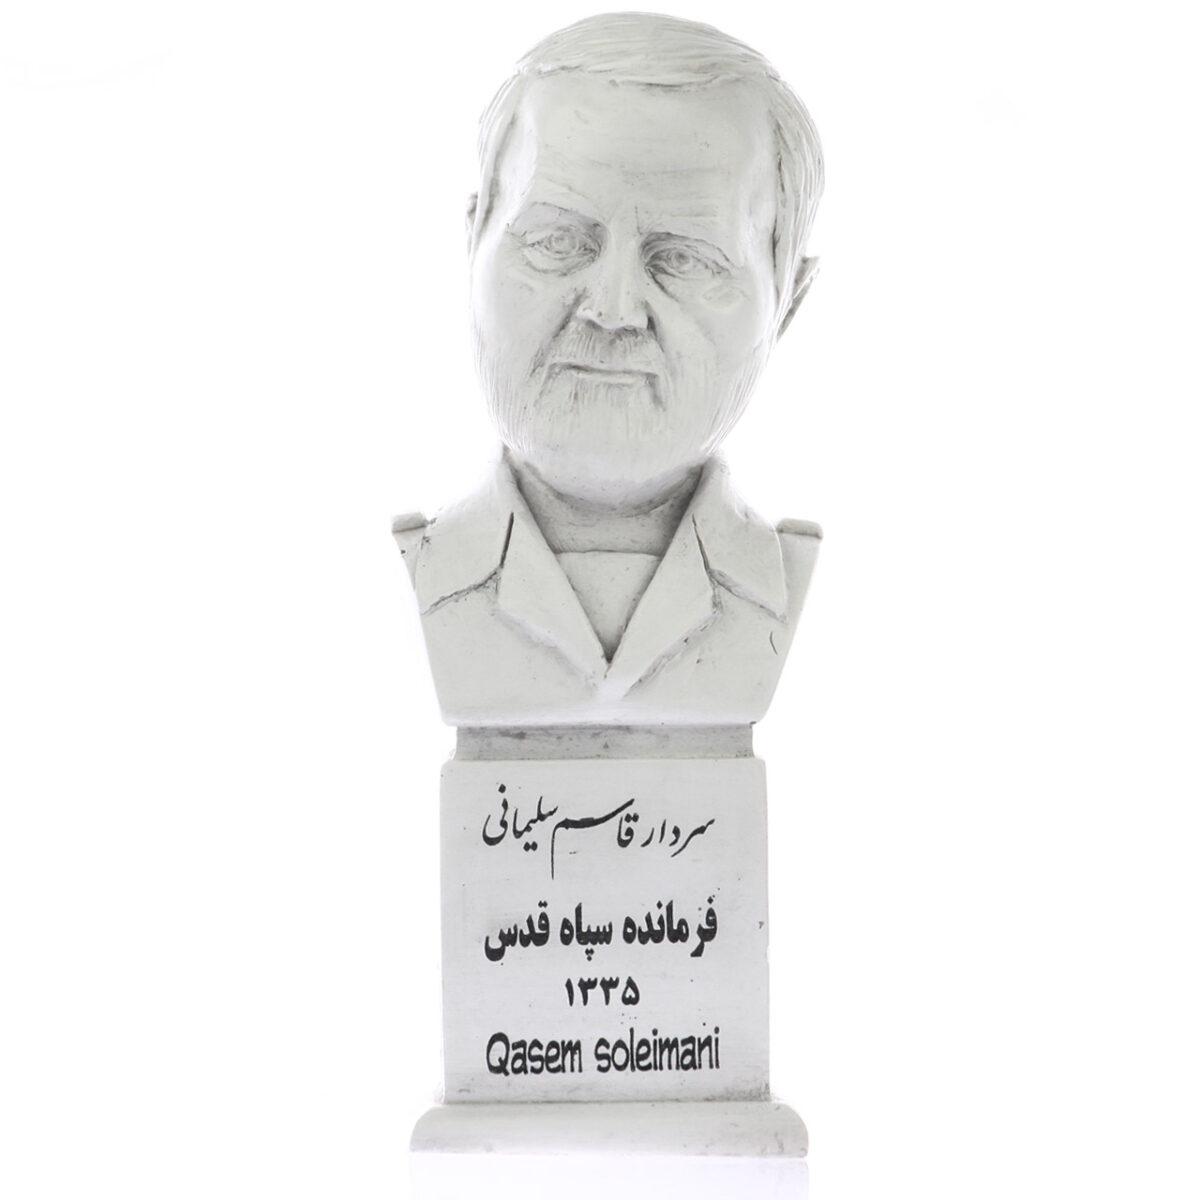 ghasem soleimani s 1200x1200 - سردیس سردار قاسم سلیمانی